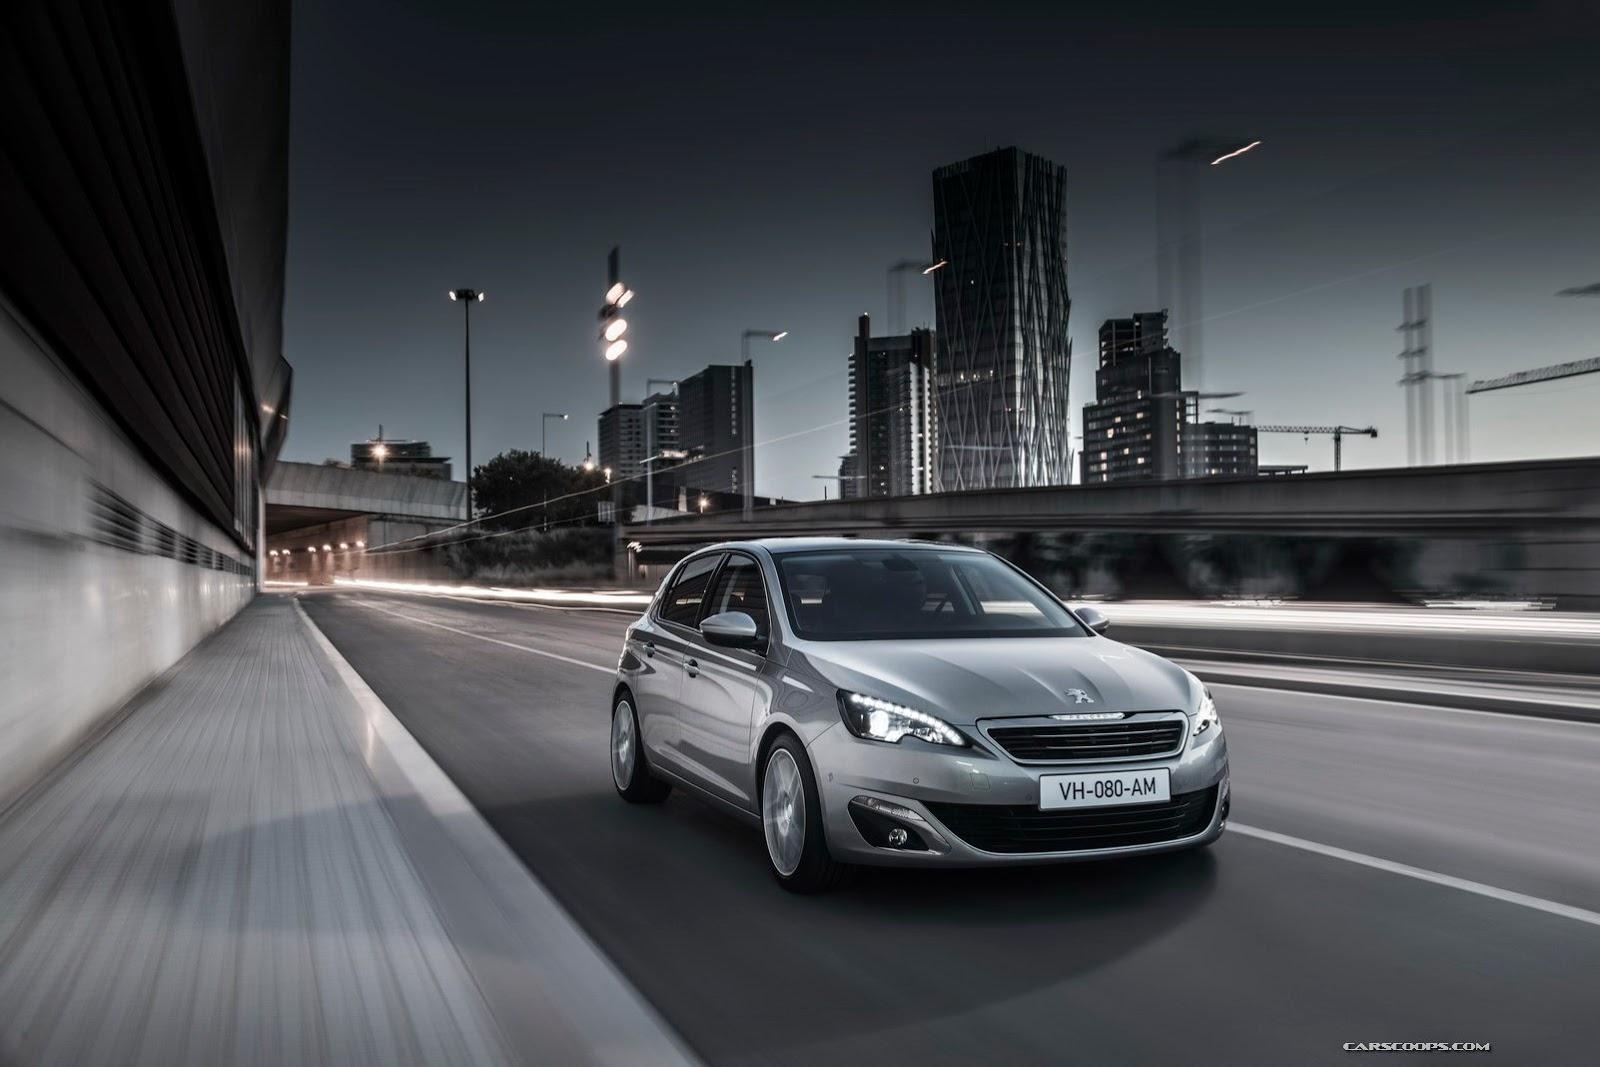 2014-Peugeot-308-Hatch-Carscoops-82%25255B2%25255D.jpg